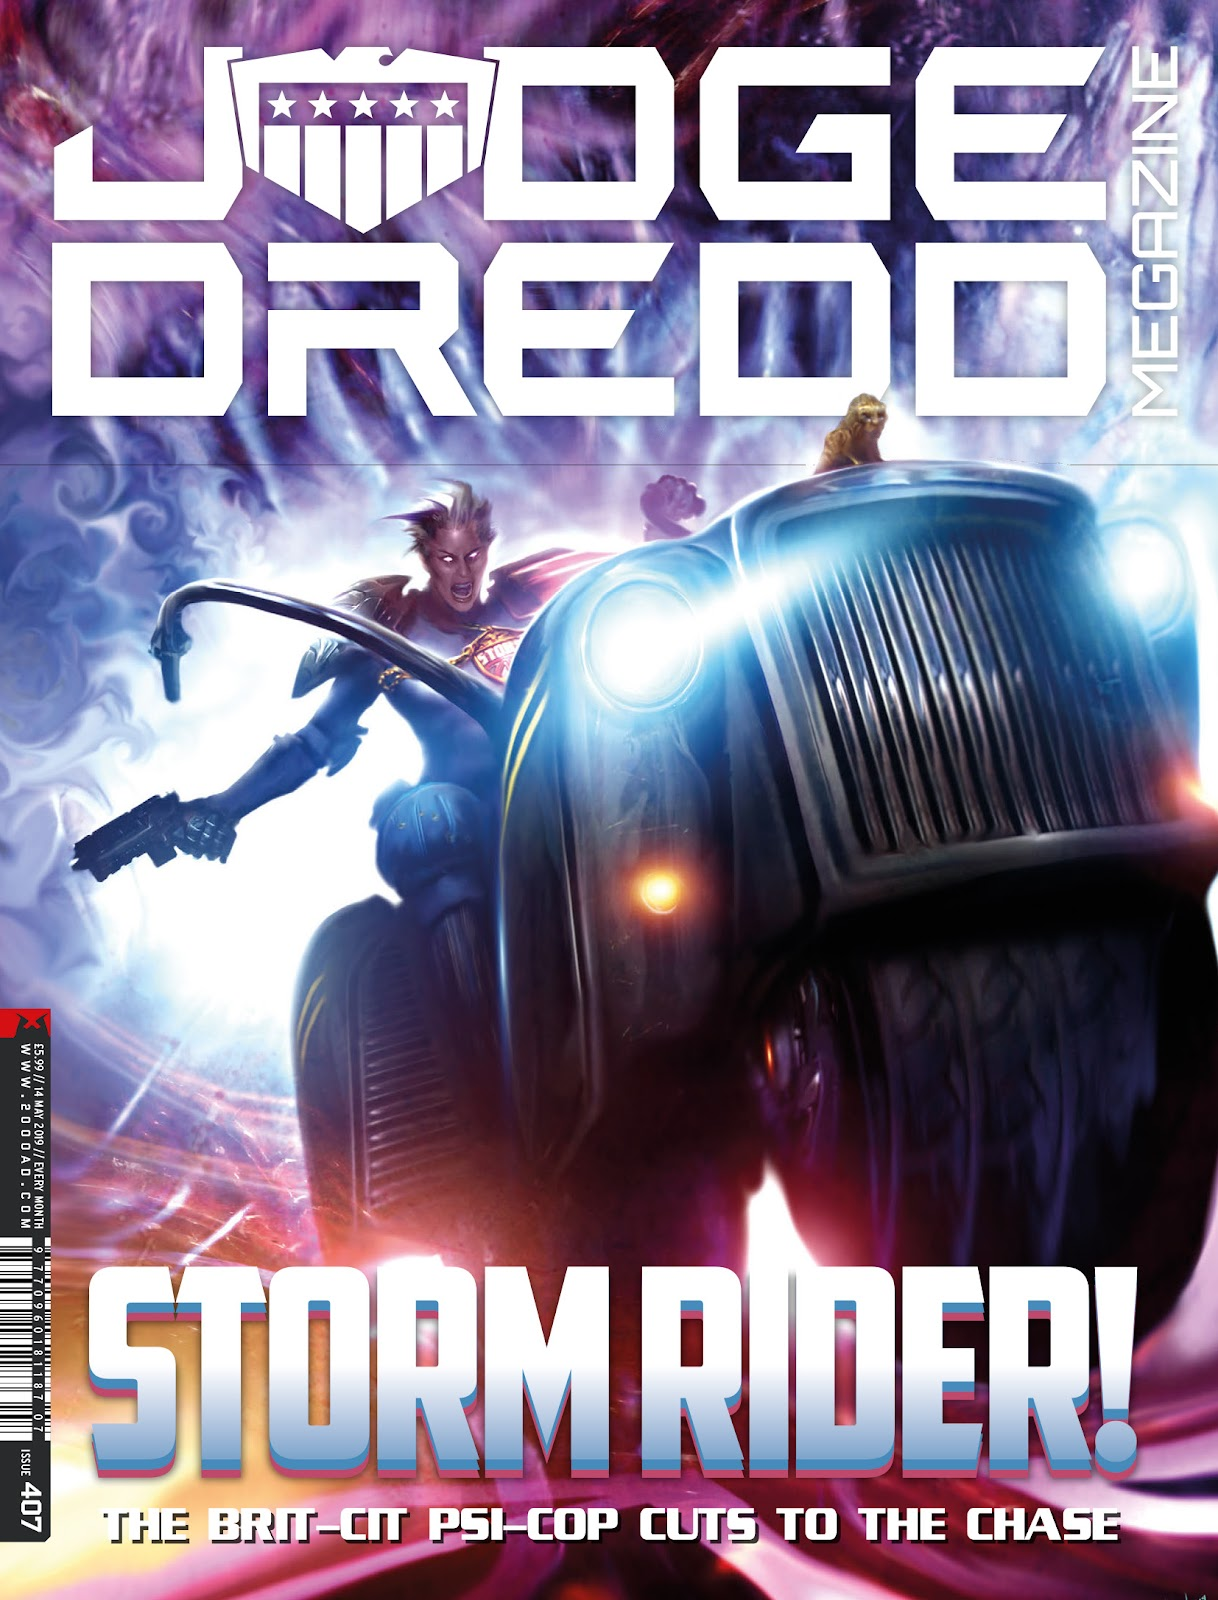 Judge Dredd Megazine (Vol. 5) issue 407 - Page 1